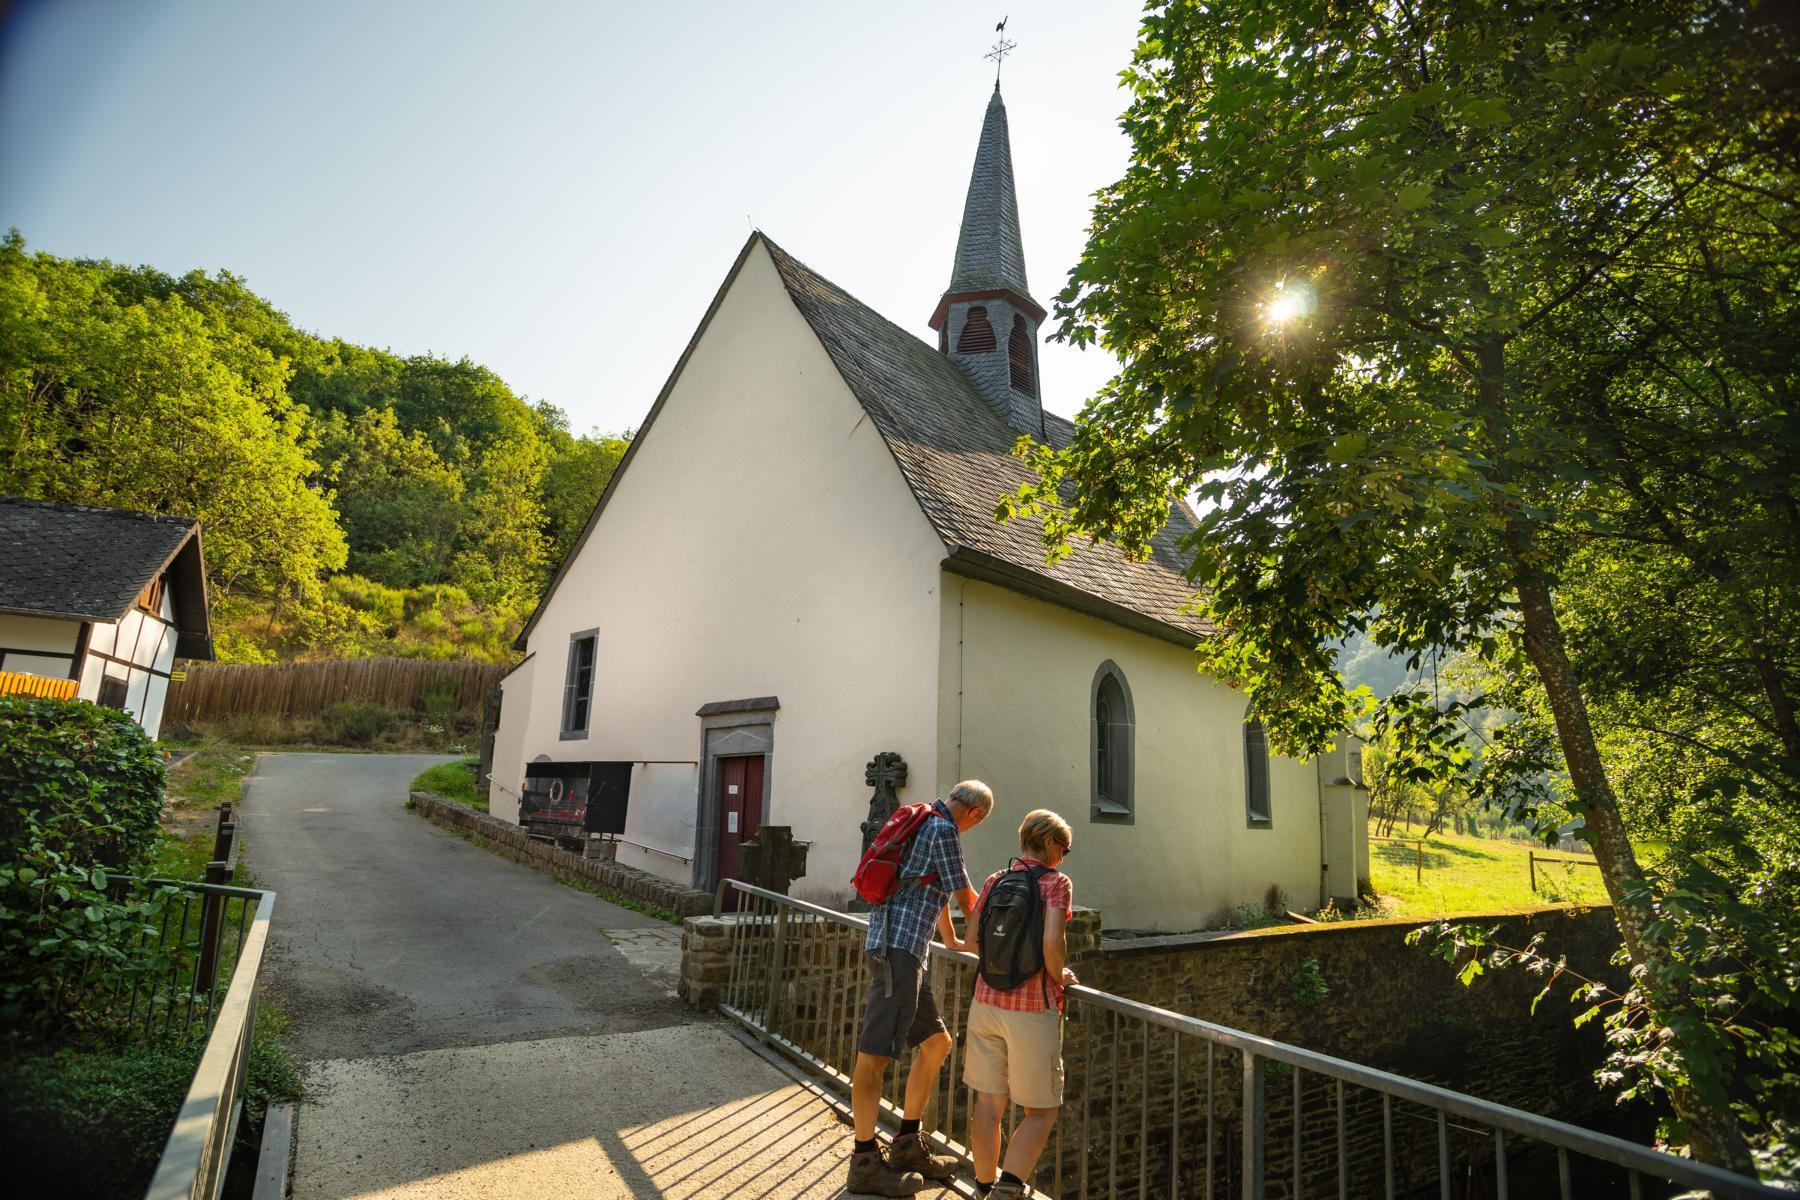 K1600_2018-08-03-Wacholderheide-Kirchwald-St.-Jost-EDIT-©-Laura-Rinneburger-2